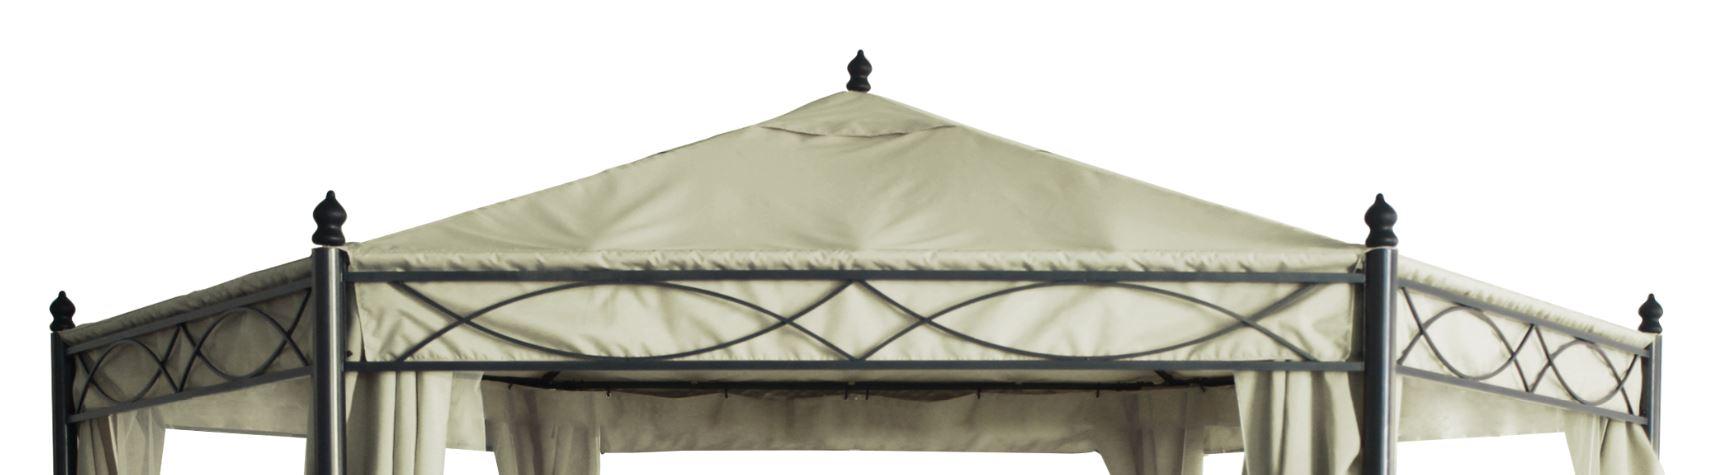 ersatzdach pavillondach dachplane pavillonplane 6 eckig f r pavillon wasserdicht ebay. Black Bedroom Furniture Sets. Home Design Ideas